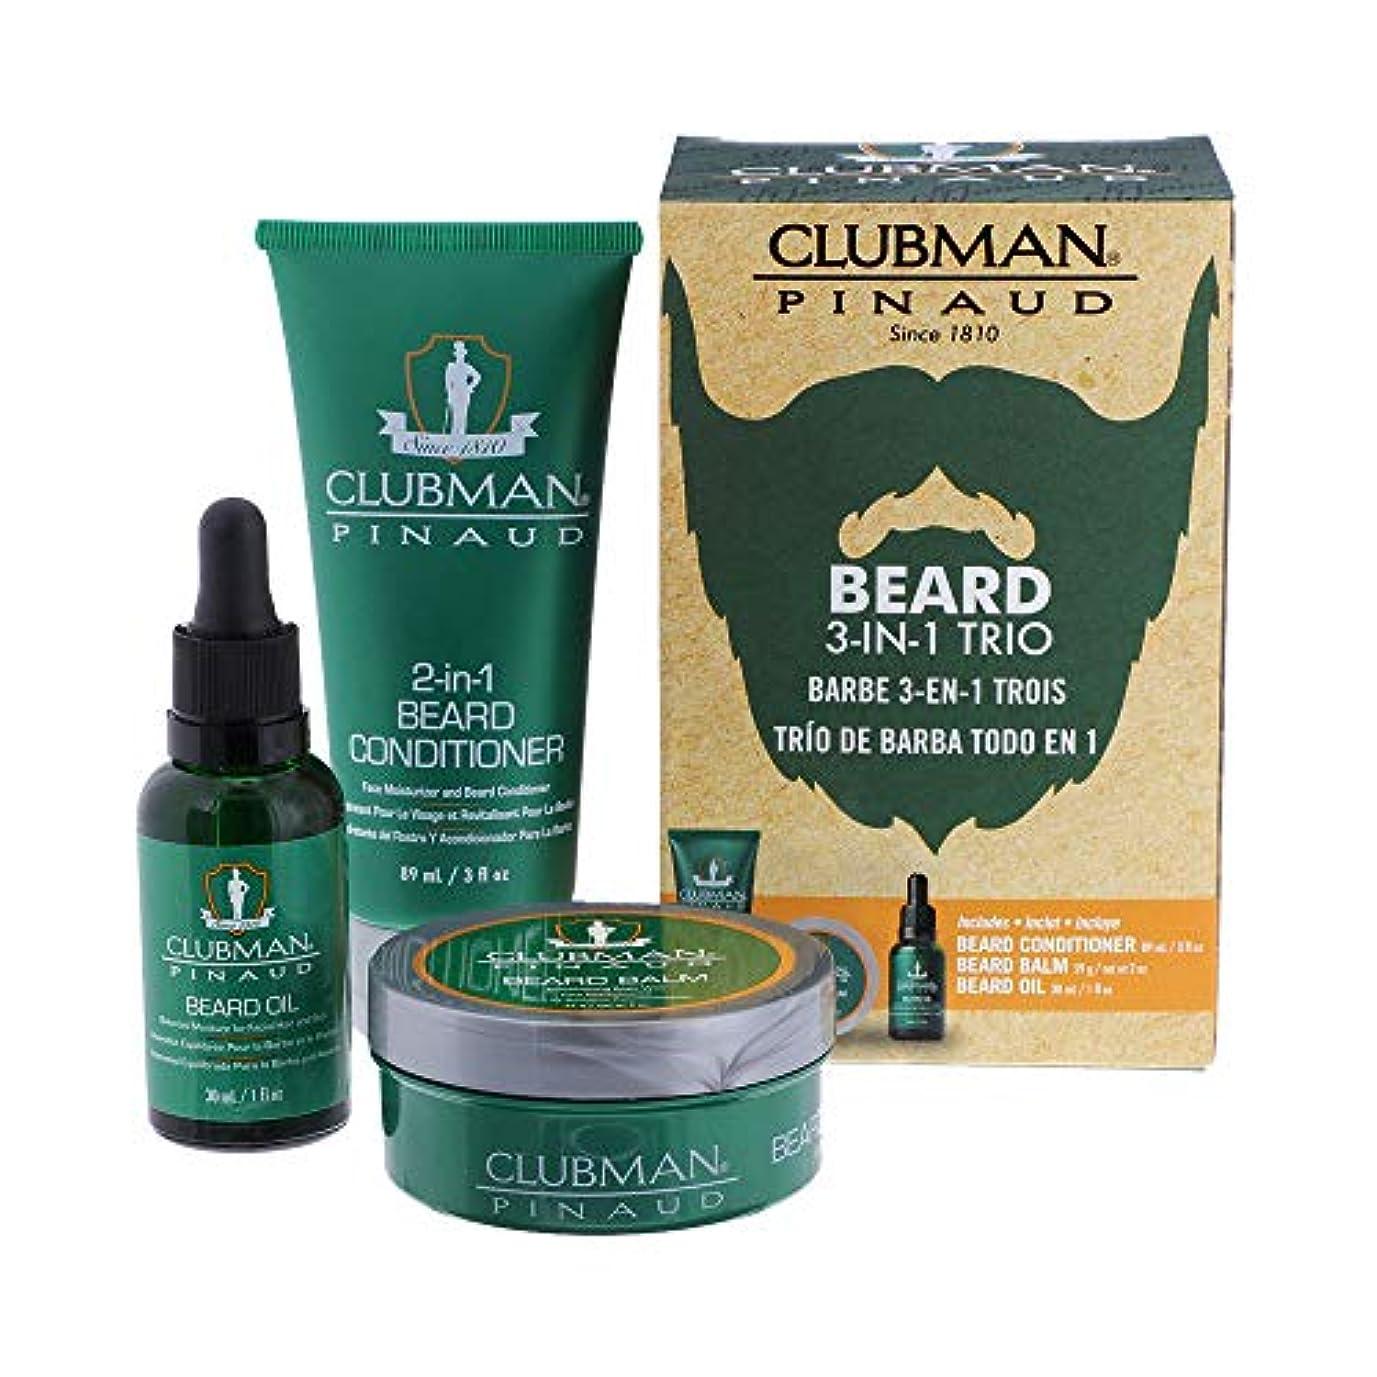 傀儡大惨事論争的CLUBMAN Beard 3 in 1 Trio - Beard Balm, Oil and 2 in 1 Conditioner (並行輸入品)